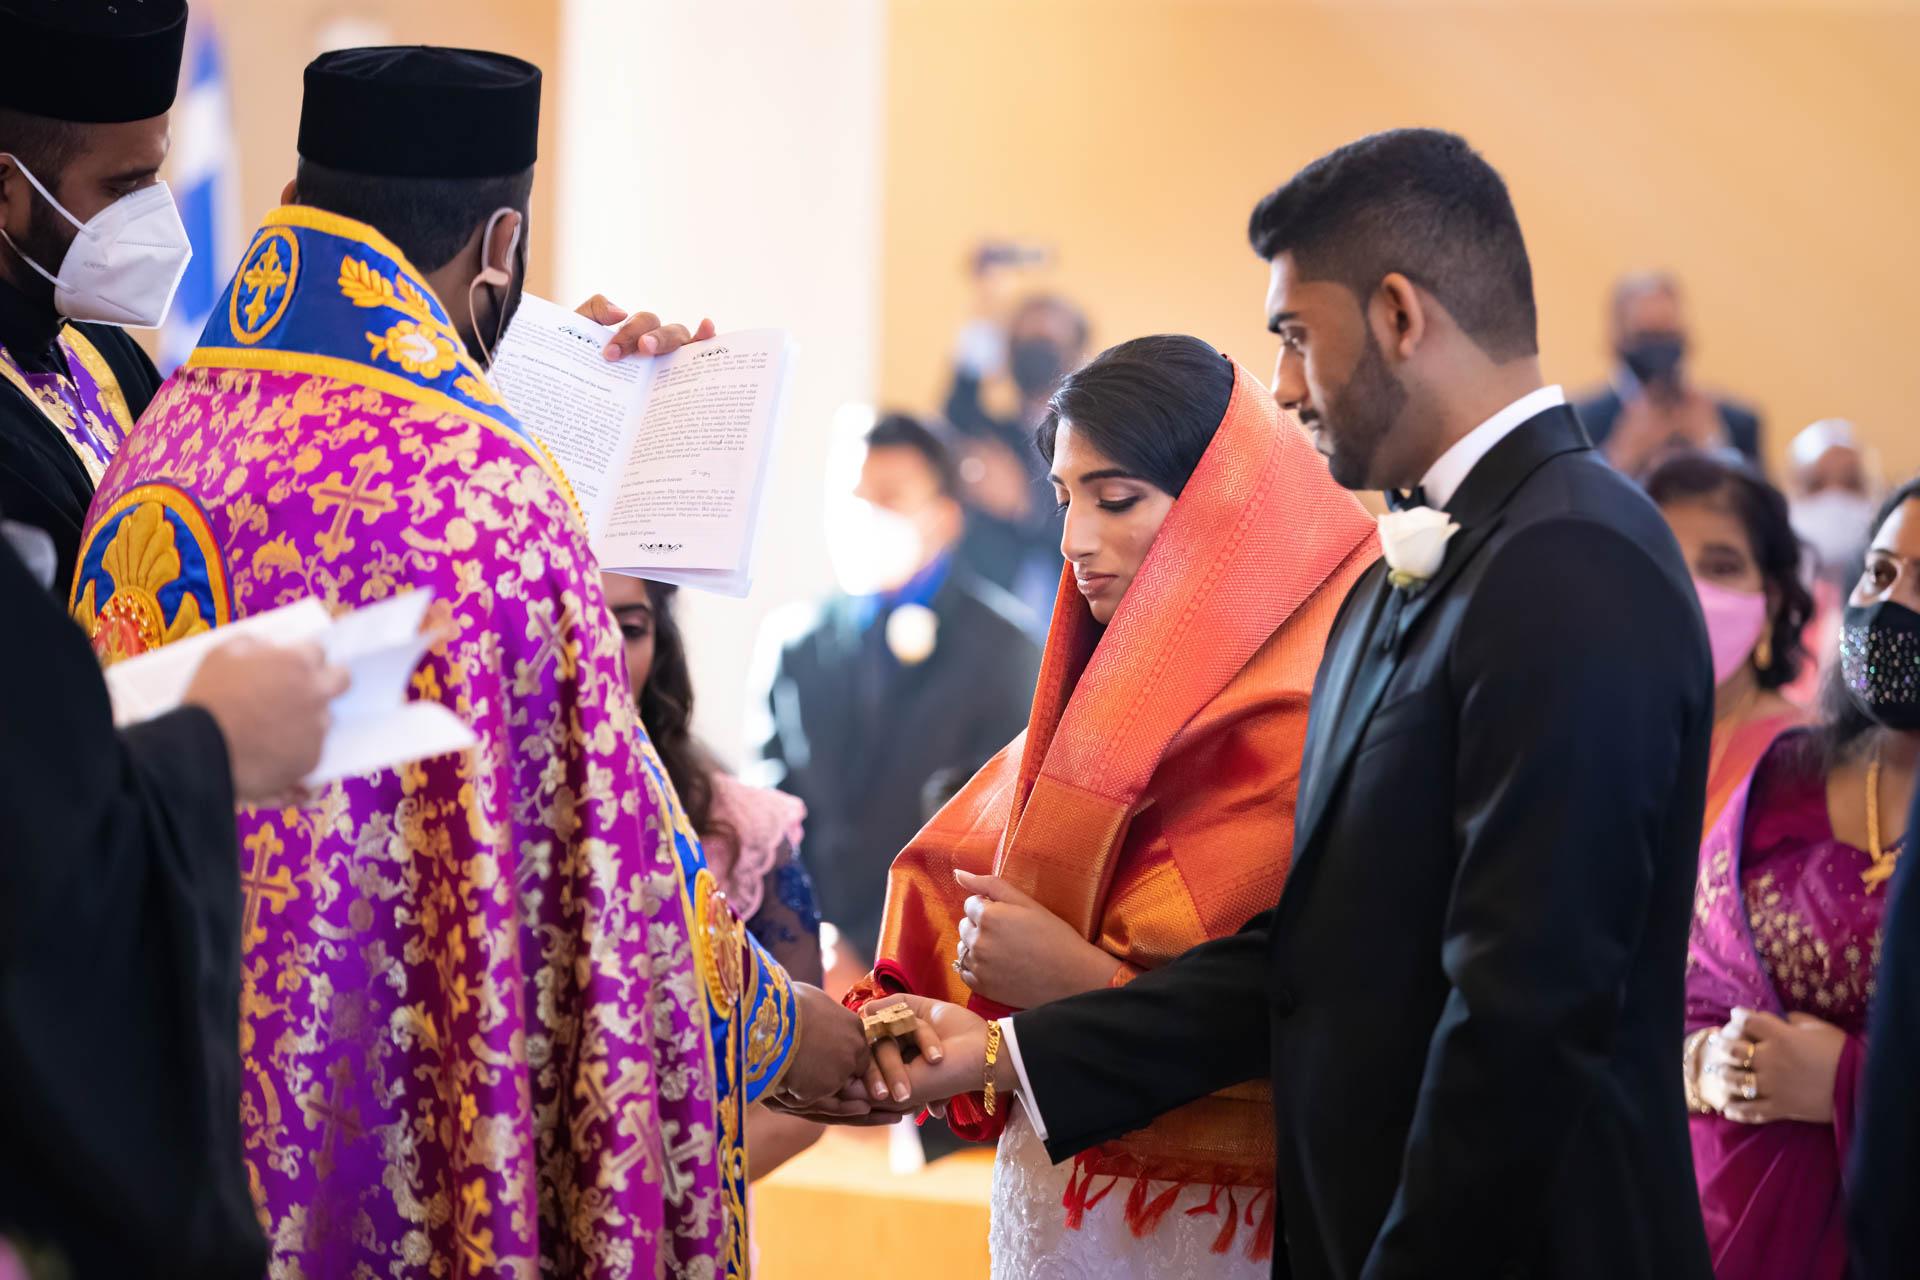 WESTMOUNT COUNTRY CLUB INDIAN WEDDING 16